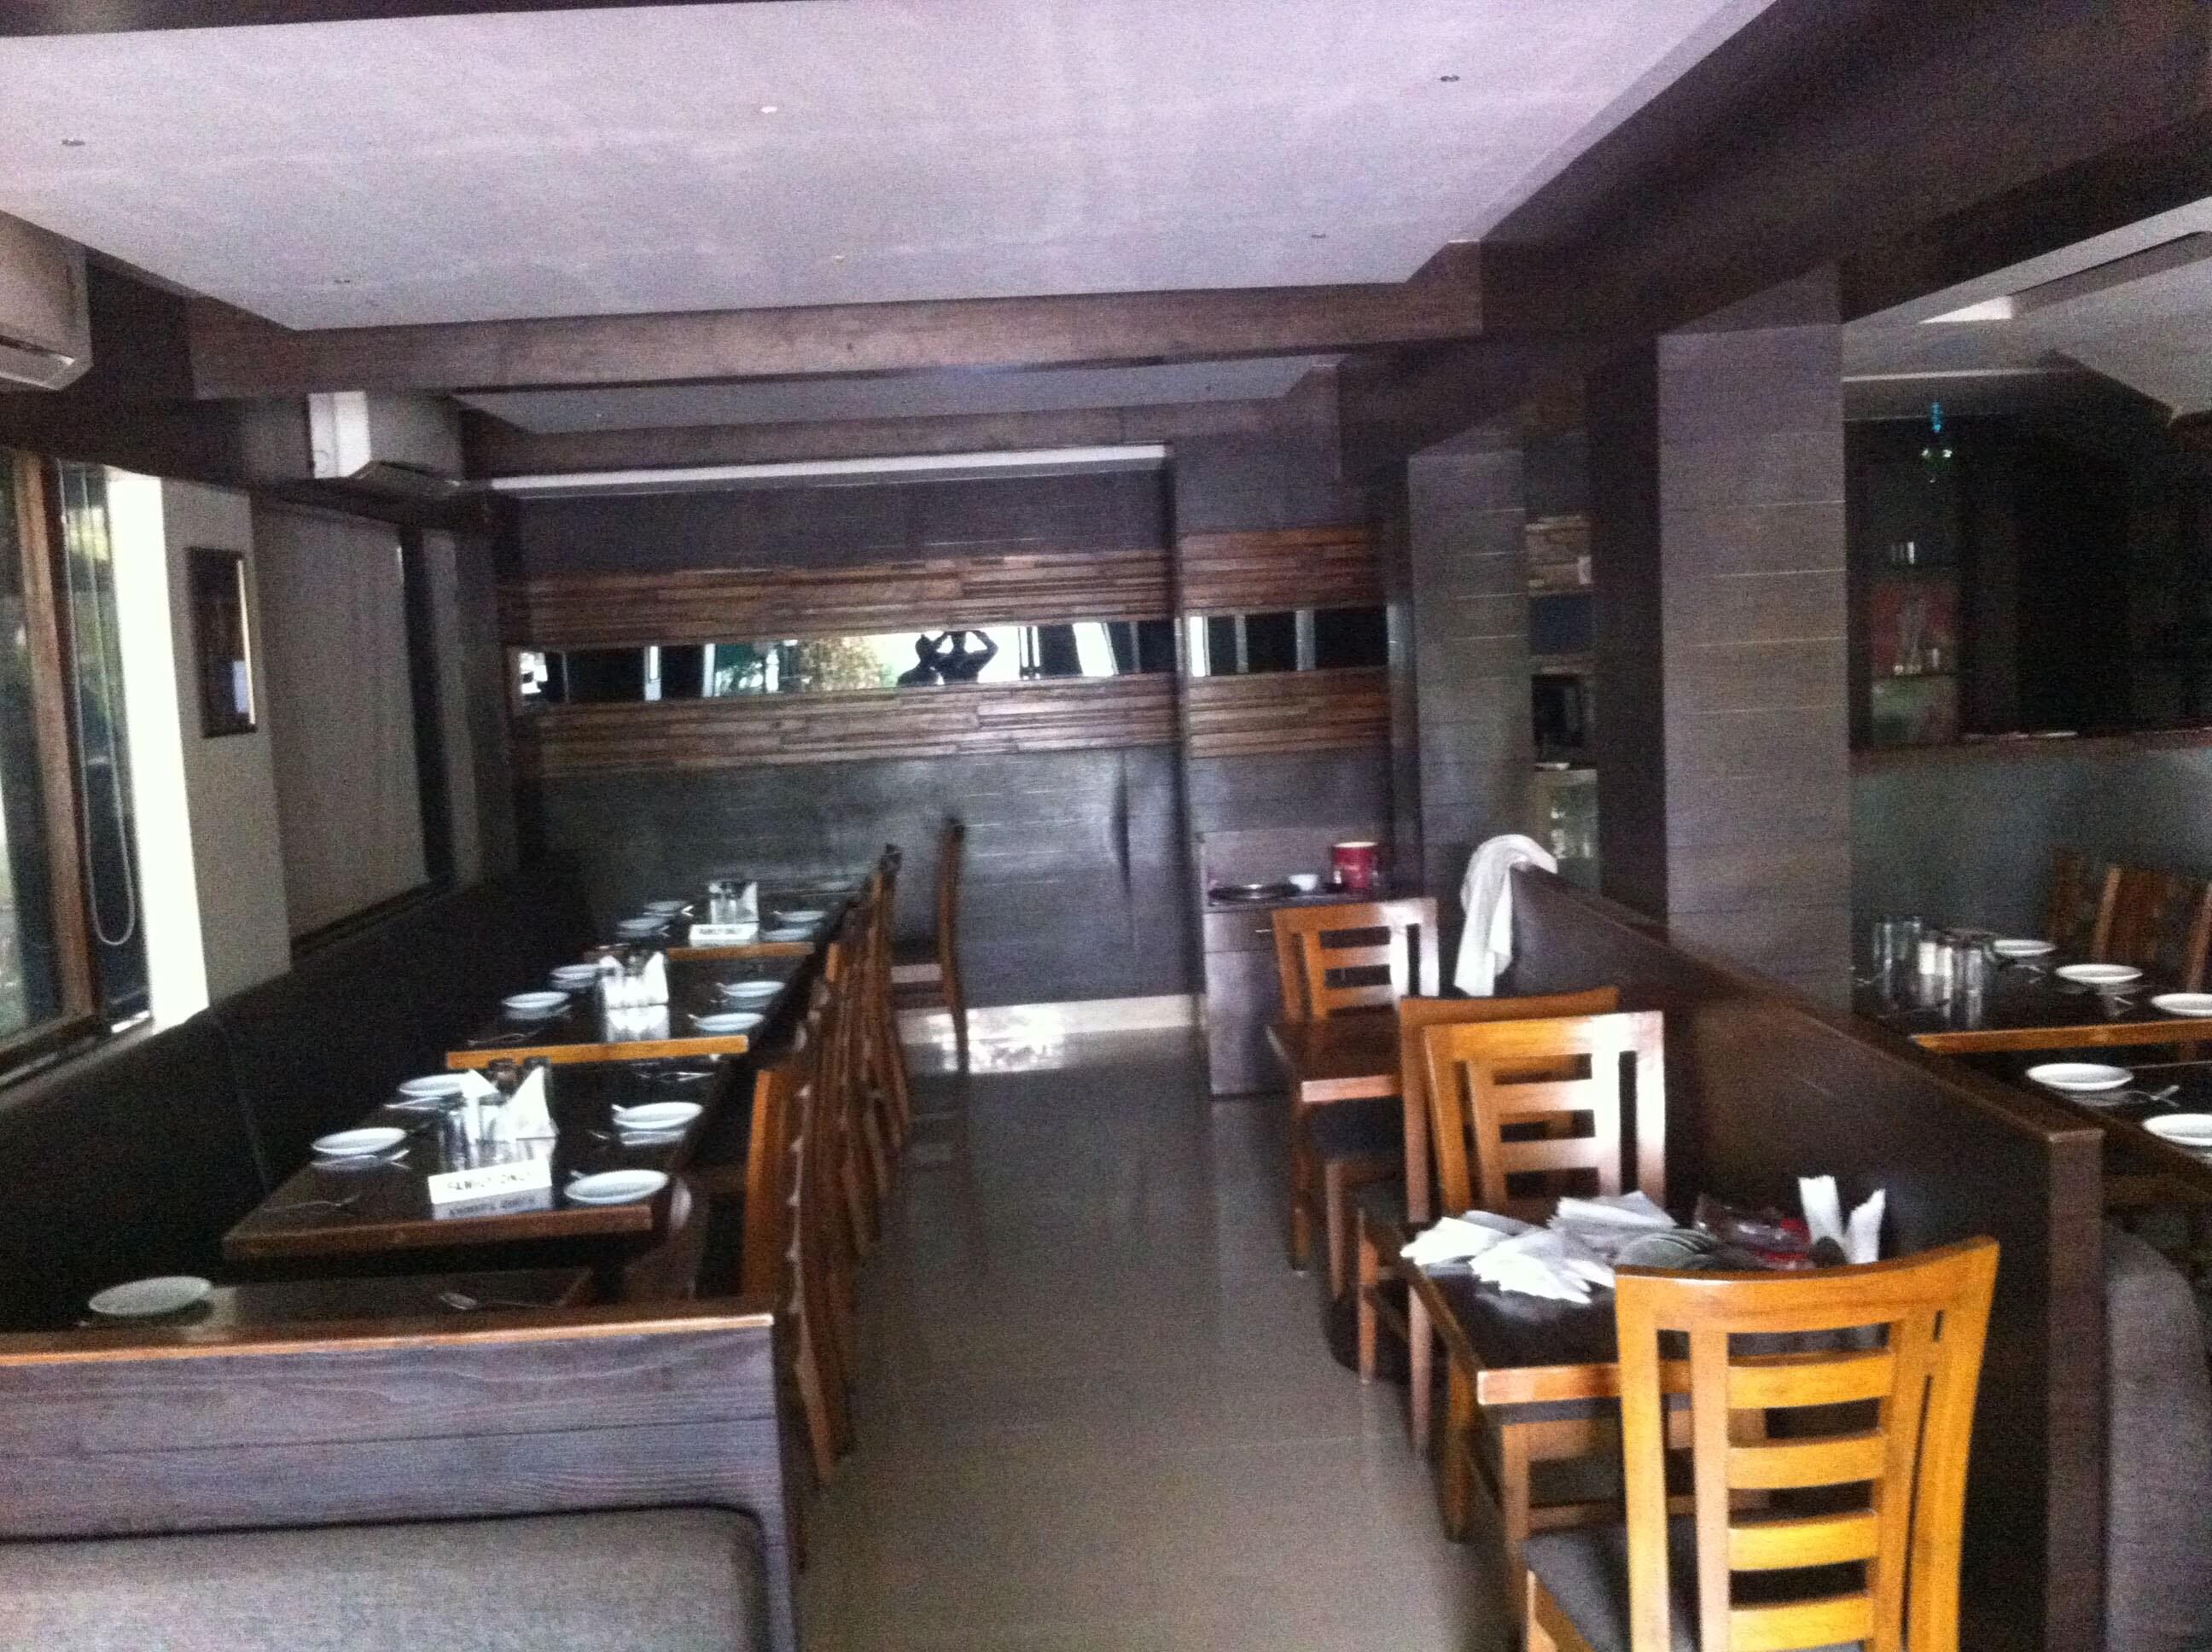 J1 Family Resto Bar - Hiranandani Estate - Thane Image